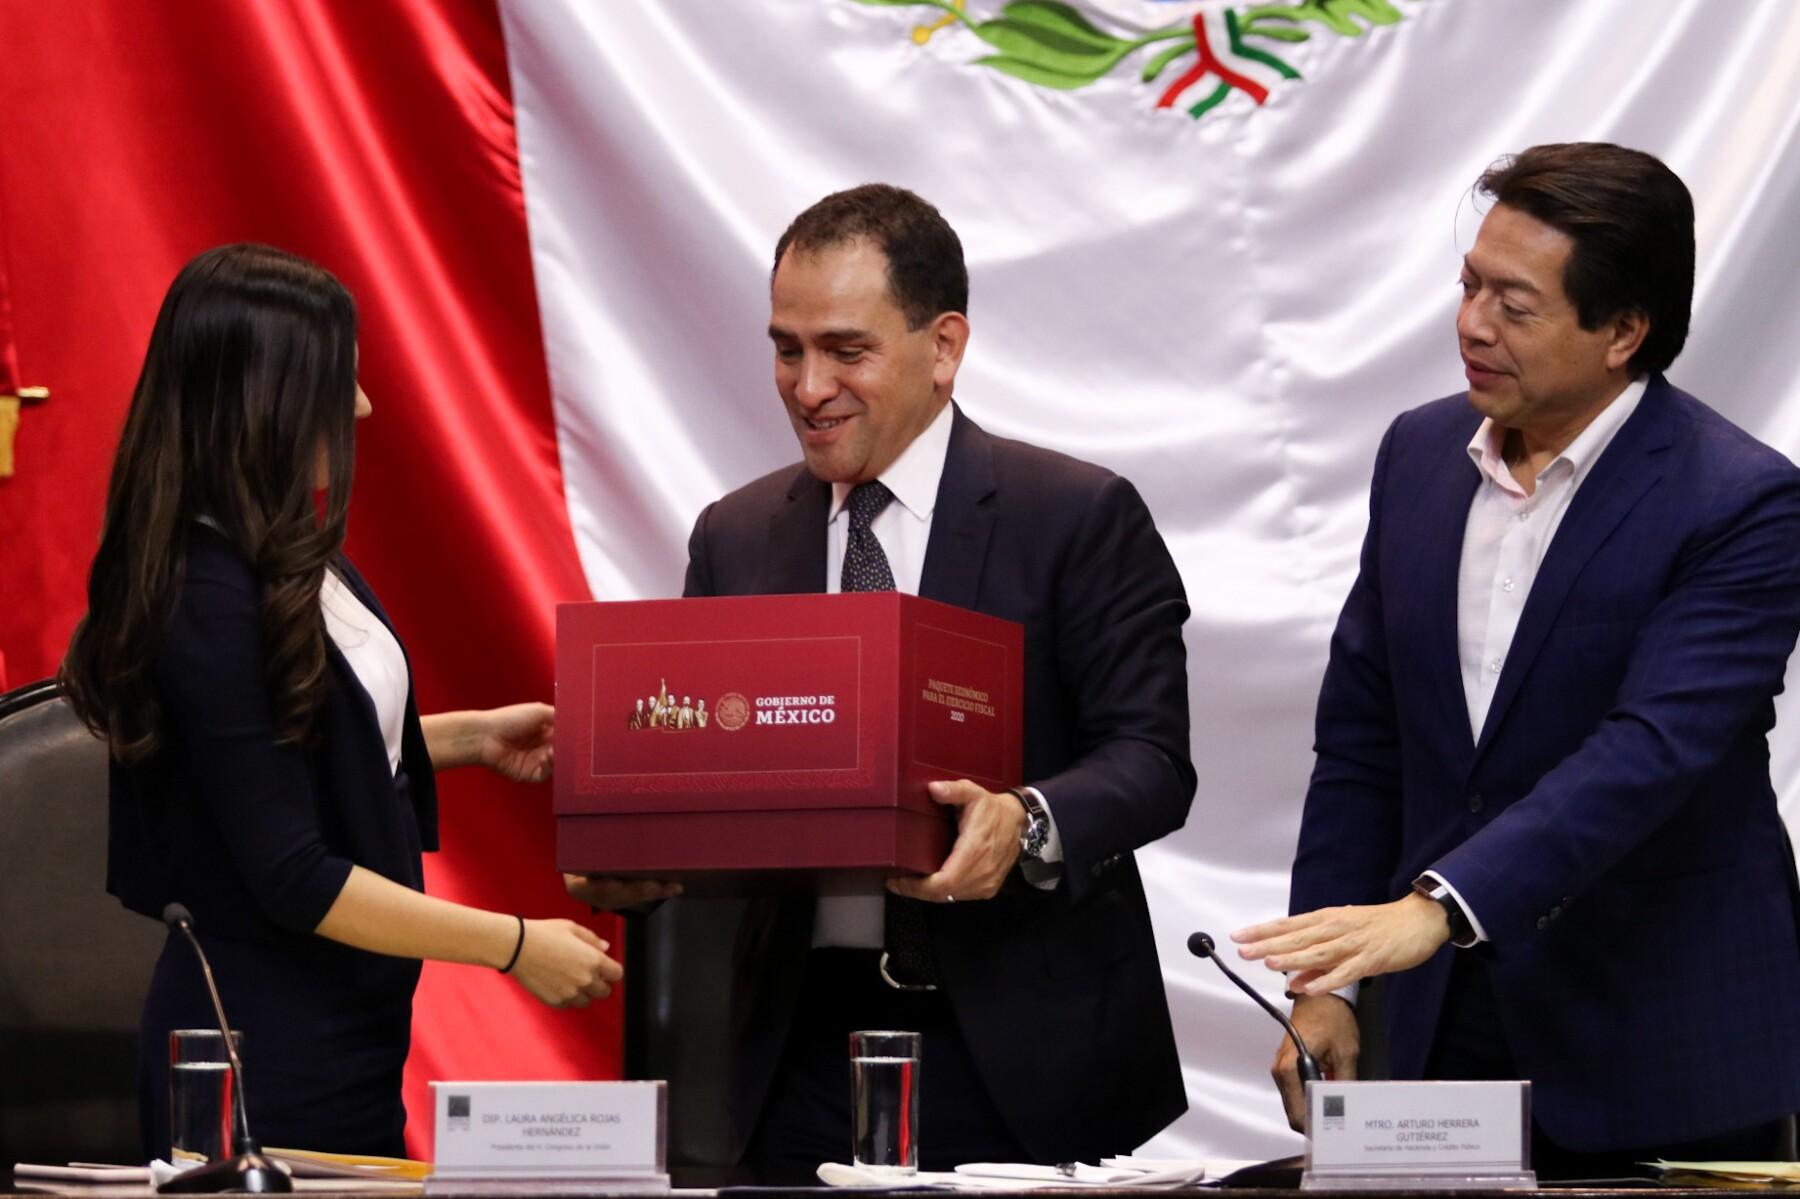 presupuesto-Herrera1.jpeg